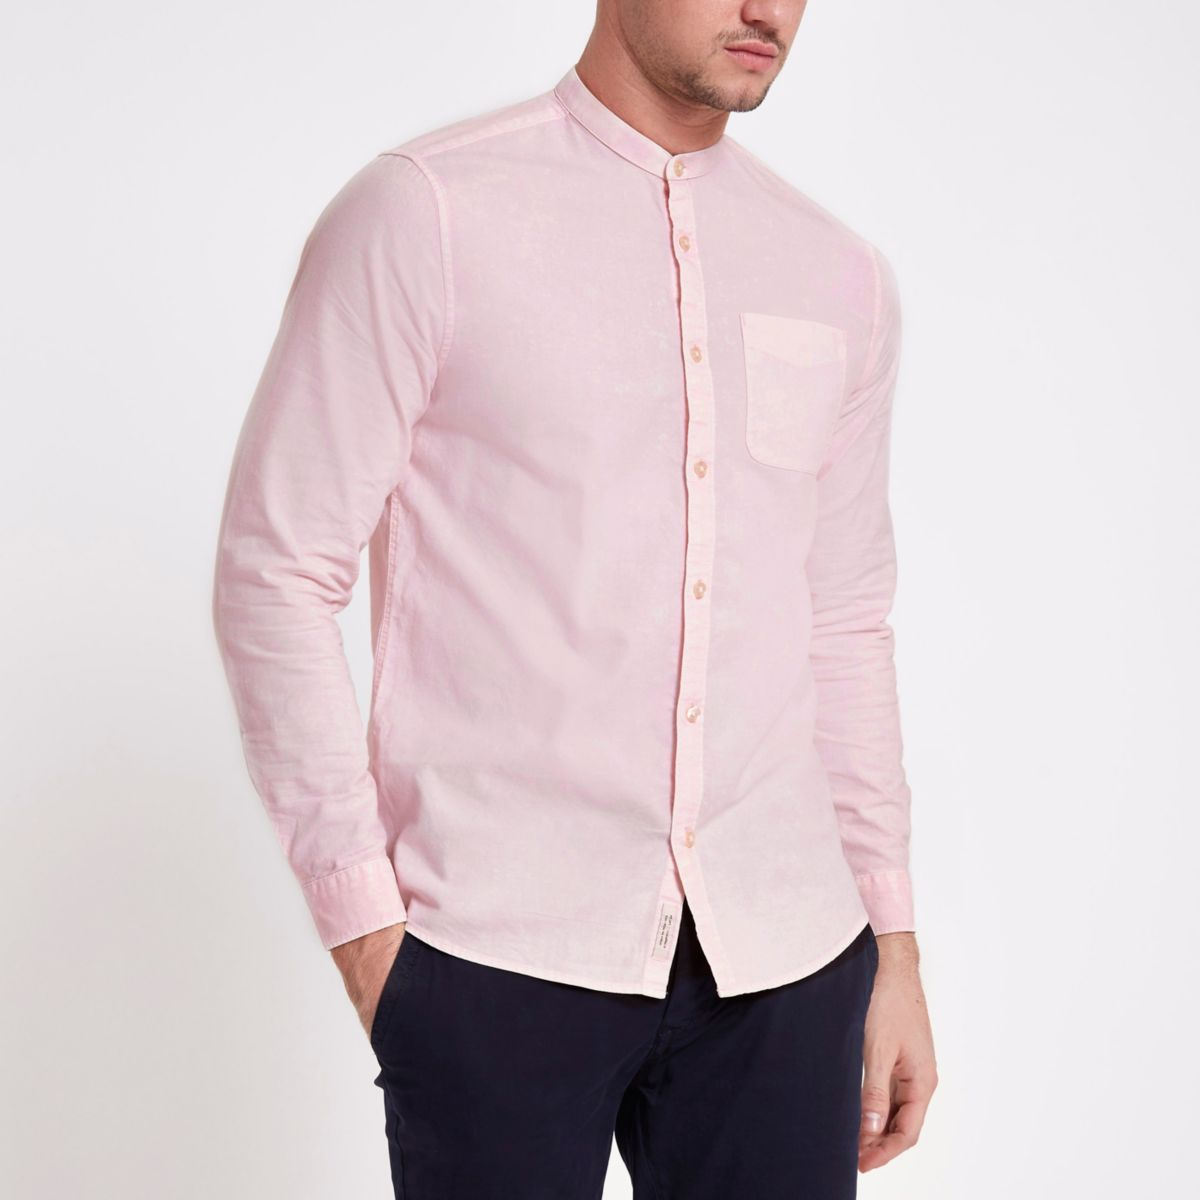 Pink acid wash long sleeve shirt